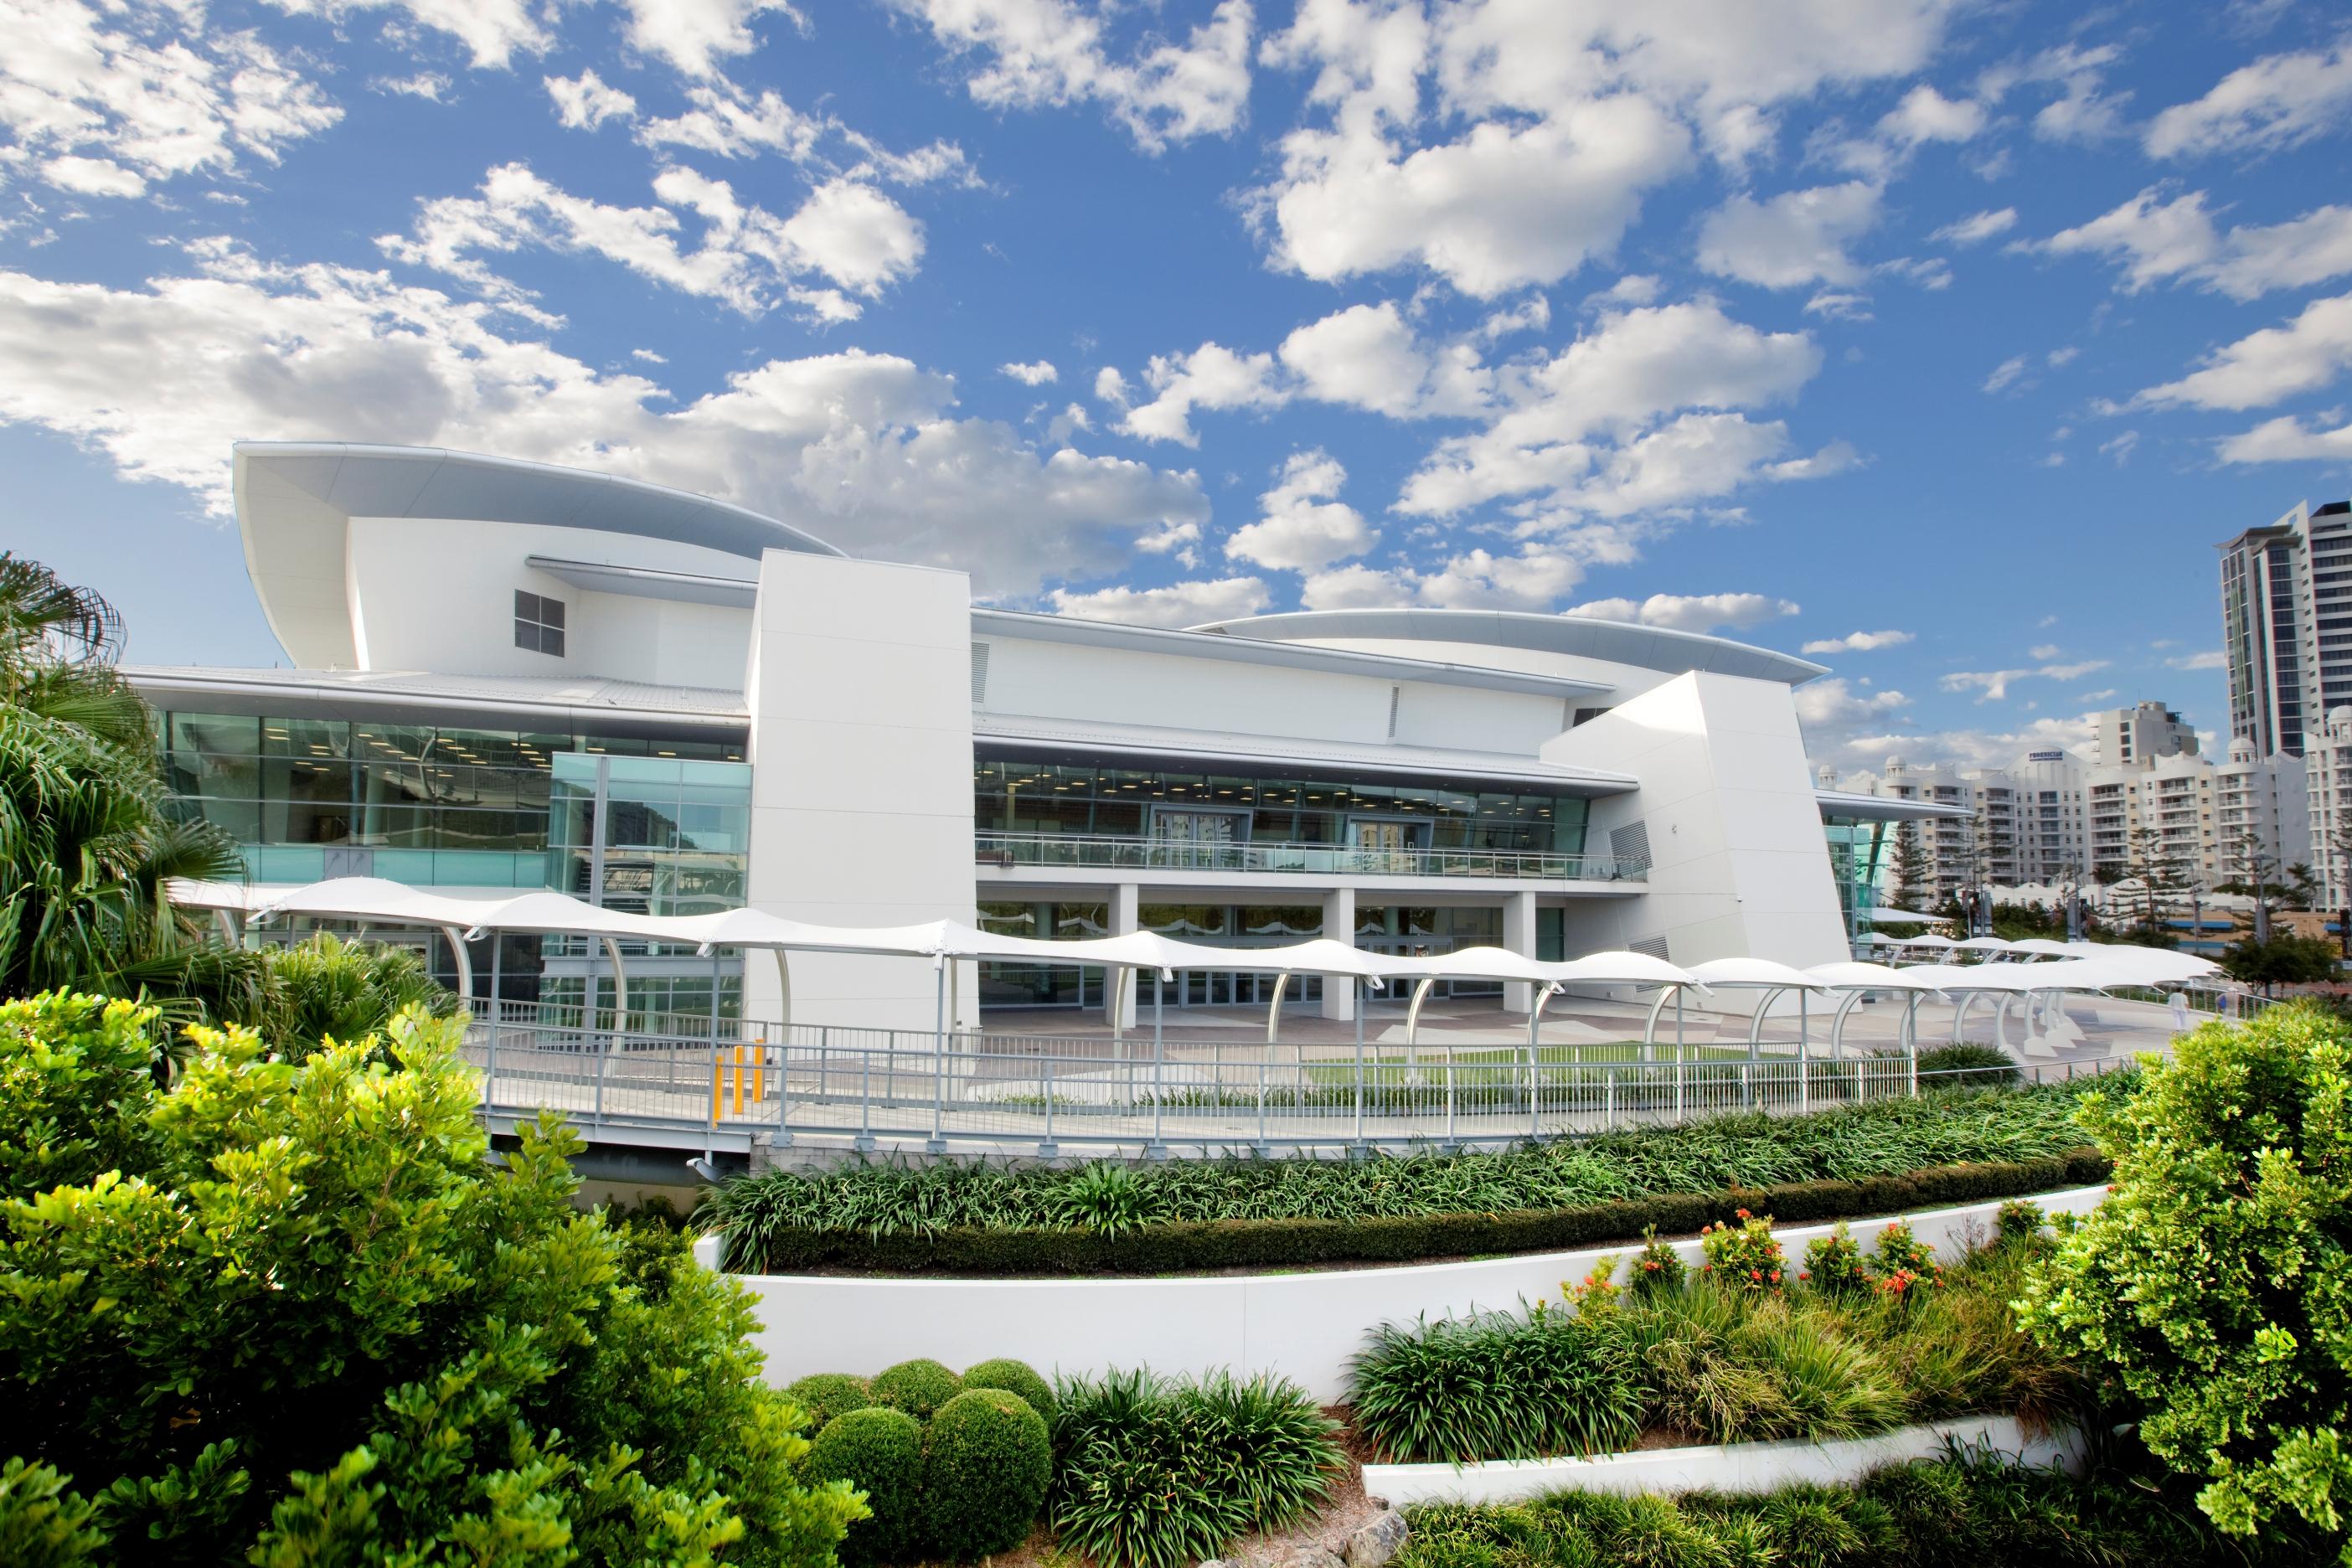 Gold Coast Convention & Exhibition Centre - Broadbeach, QLD 4218 - (07) 5504 4000 | ShowMeLocal.com